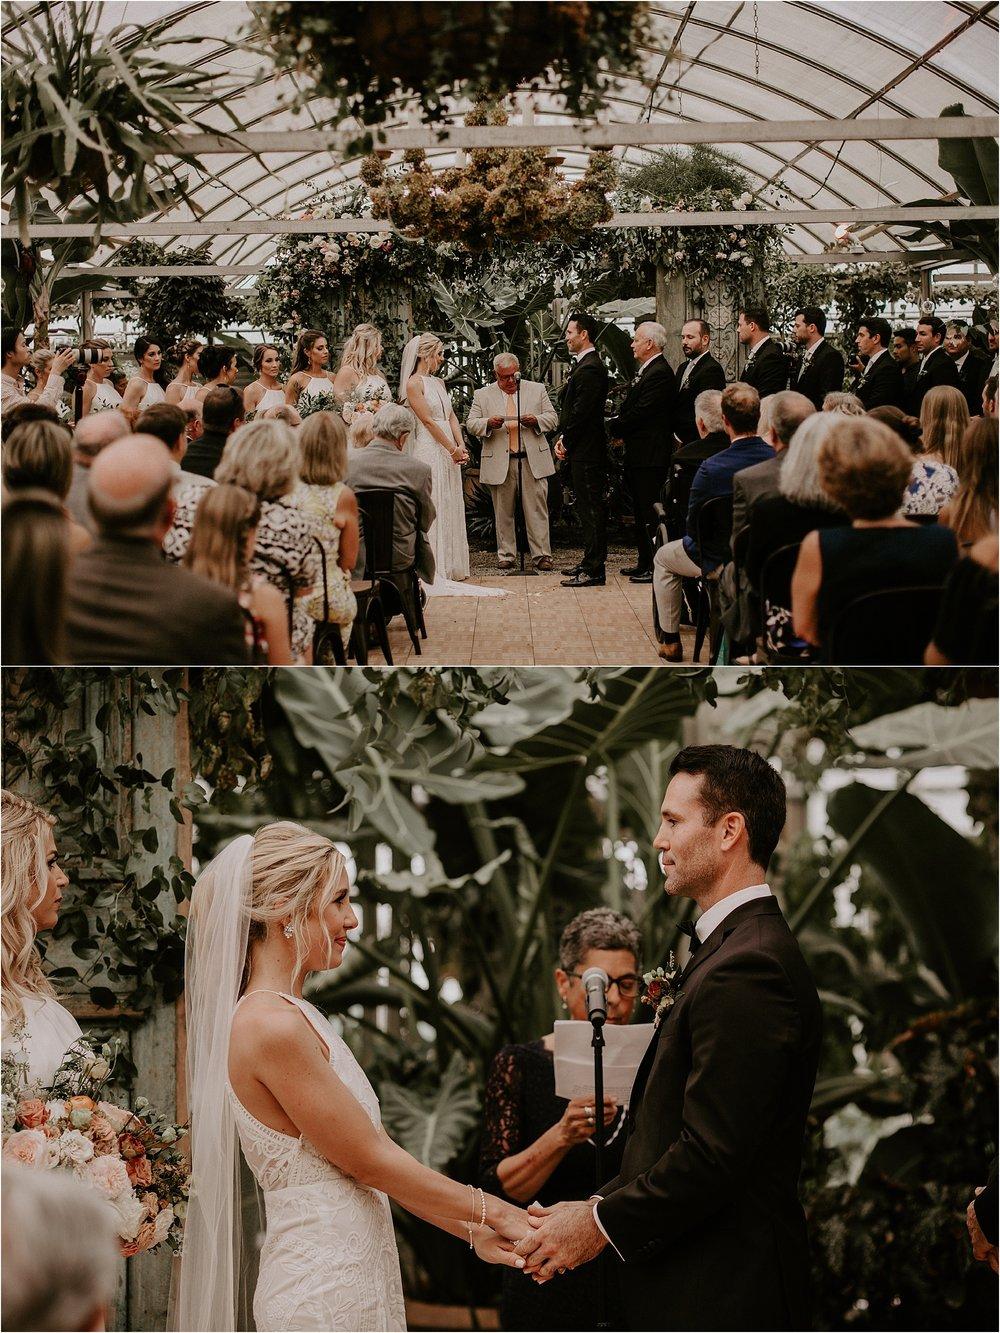 Sarah_Brookhart_Hortulus_Farm_Garden_and_Nursey_Wedding_Photographer_0047.jpg